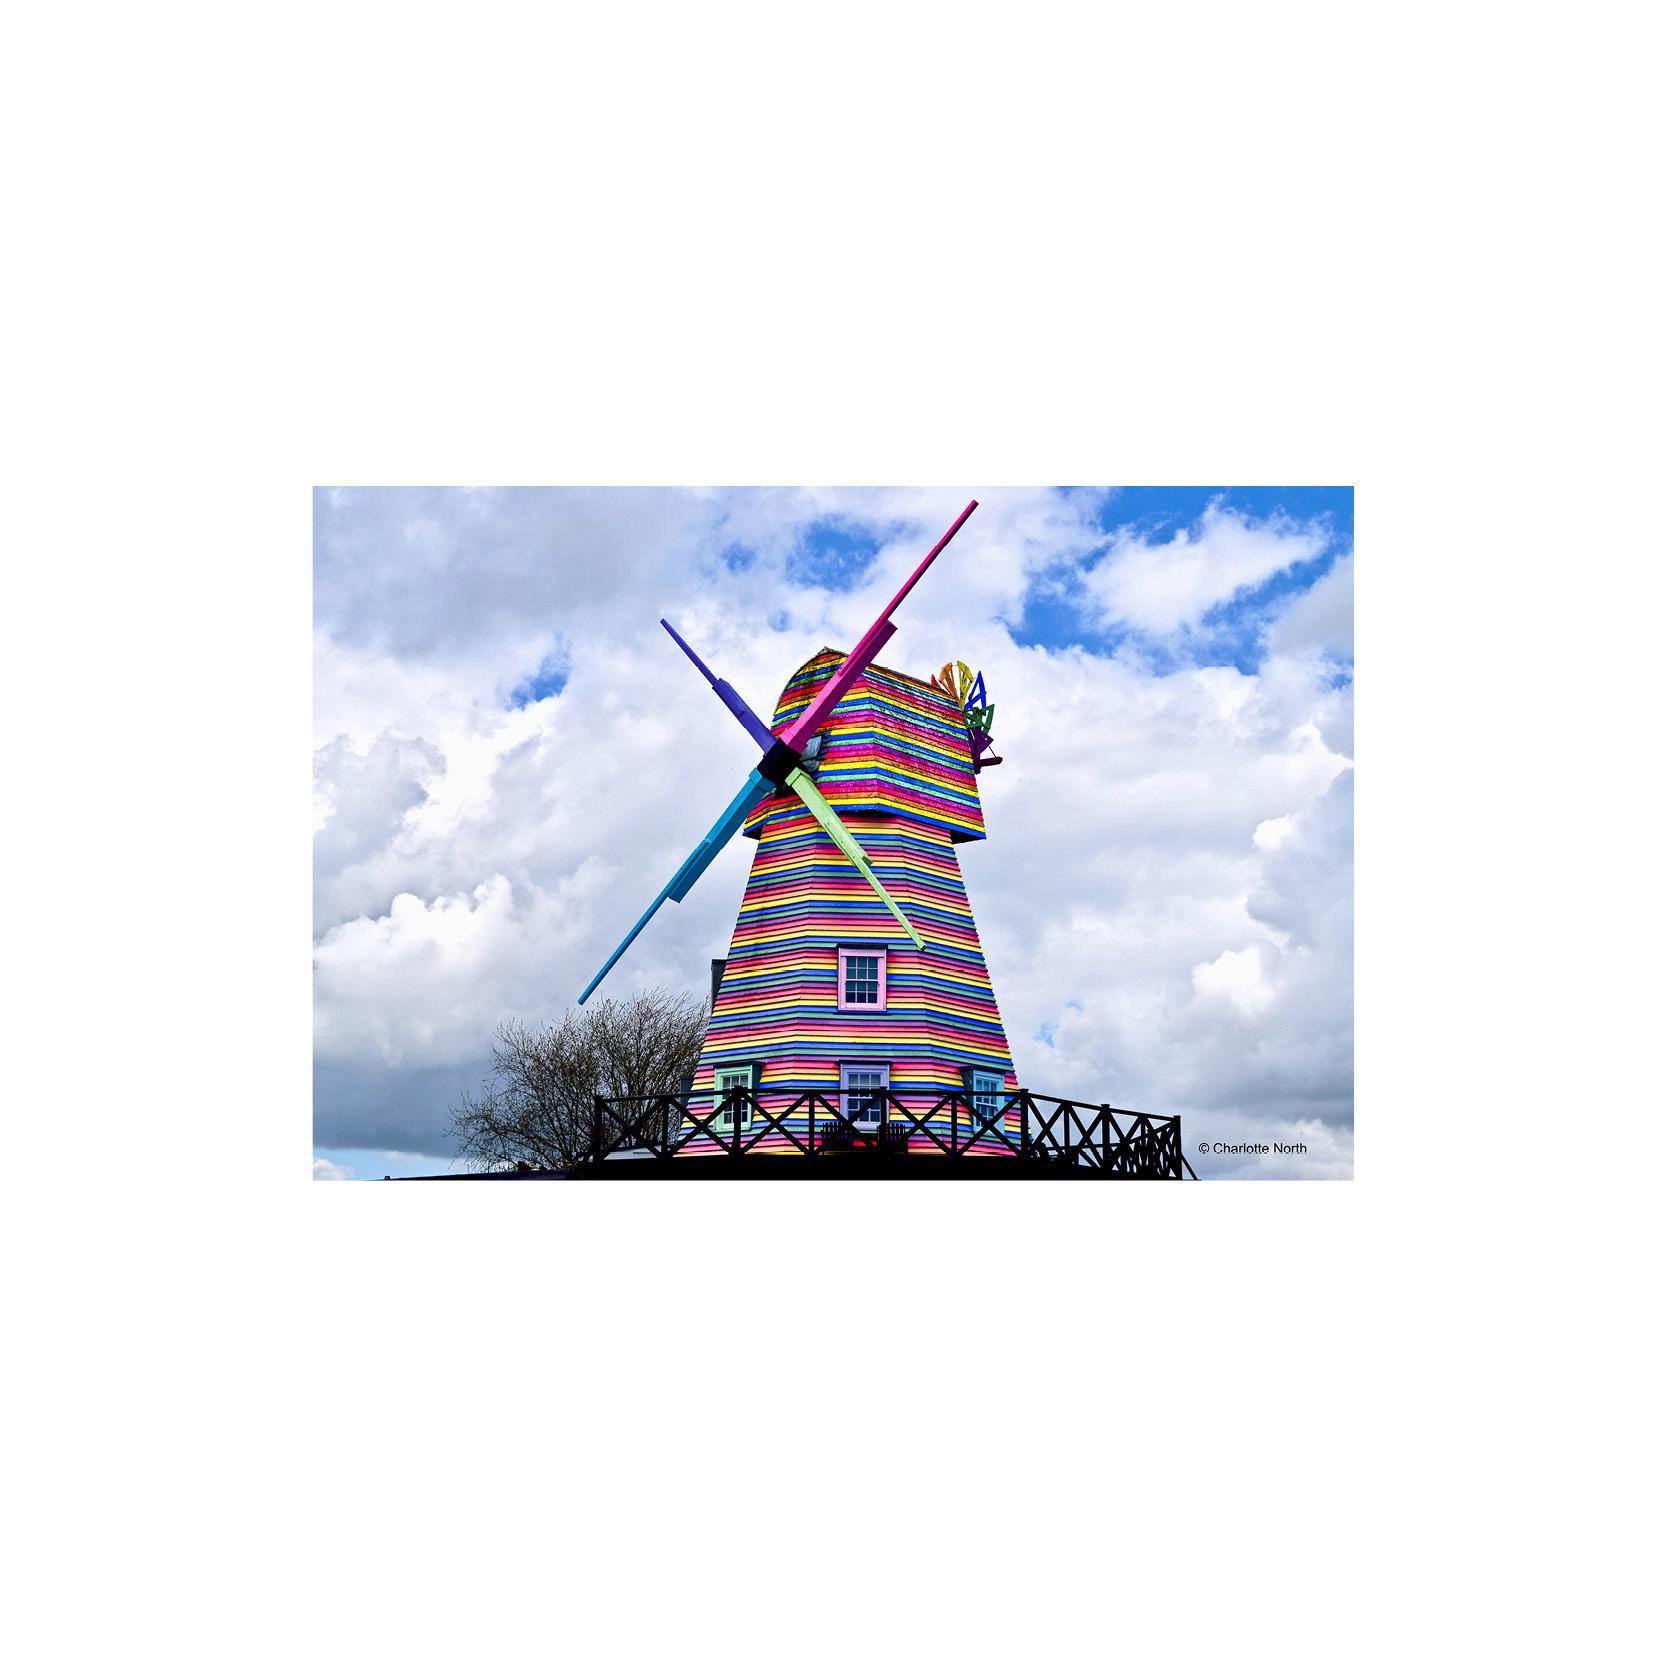 Charlotte North - Rye Windmill Print